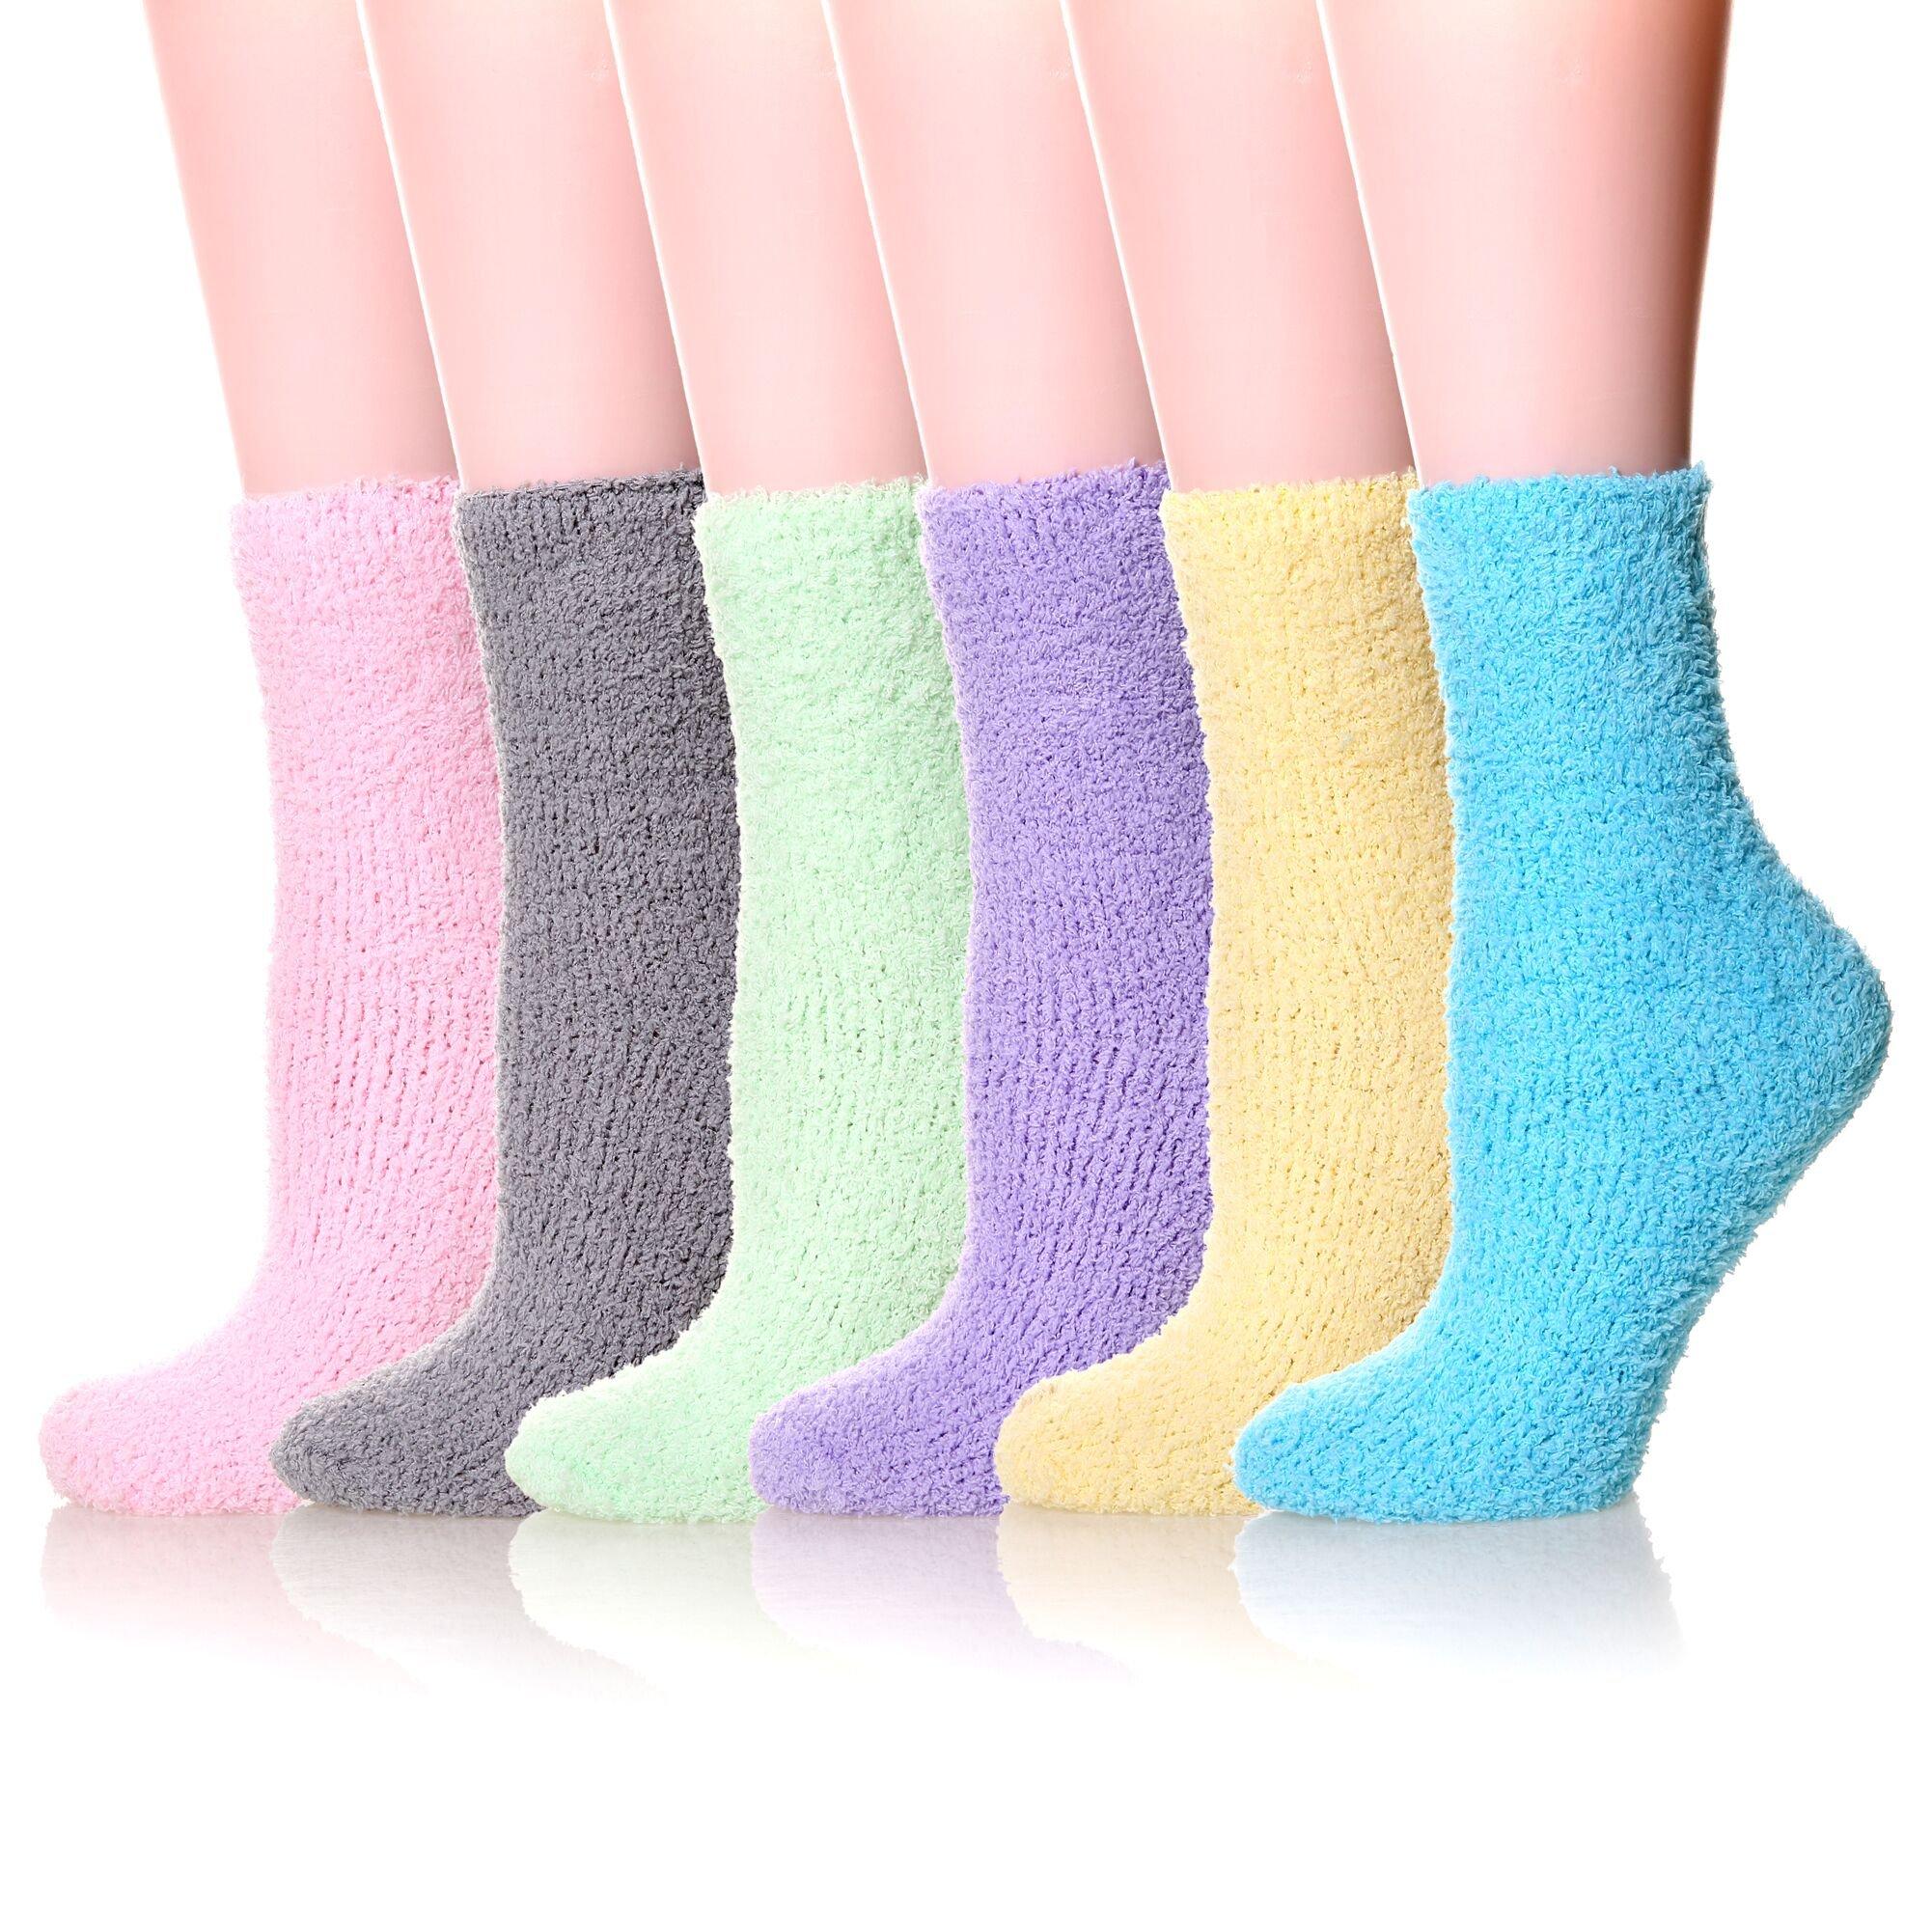 YEBING 6 Pairs Women's Cozy Slipper Socks Super Soft Fuzzy Winter Warm Socks Multi Color (6 Pack Style A)